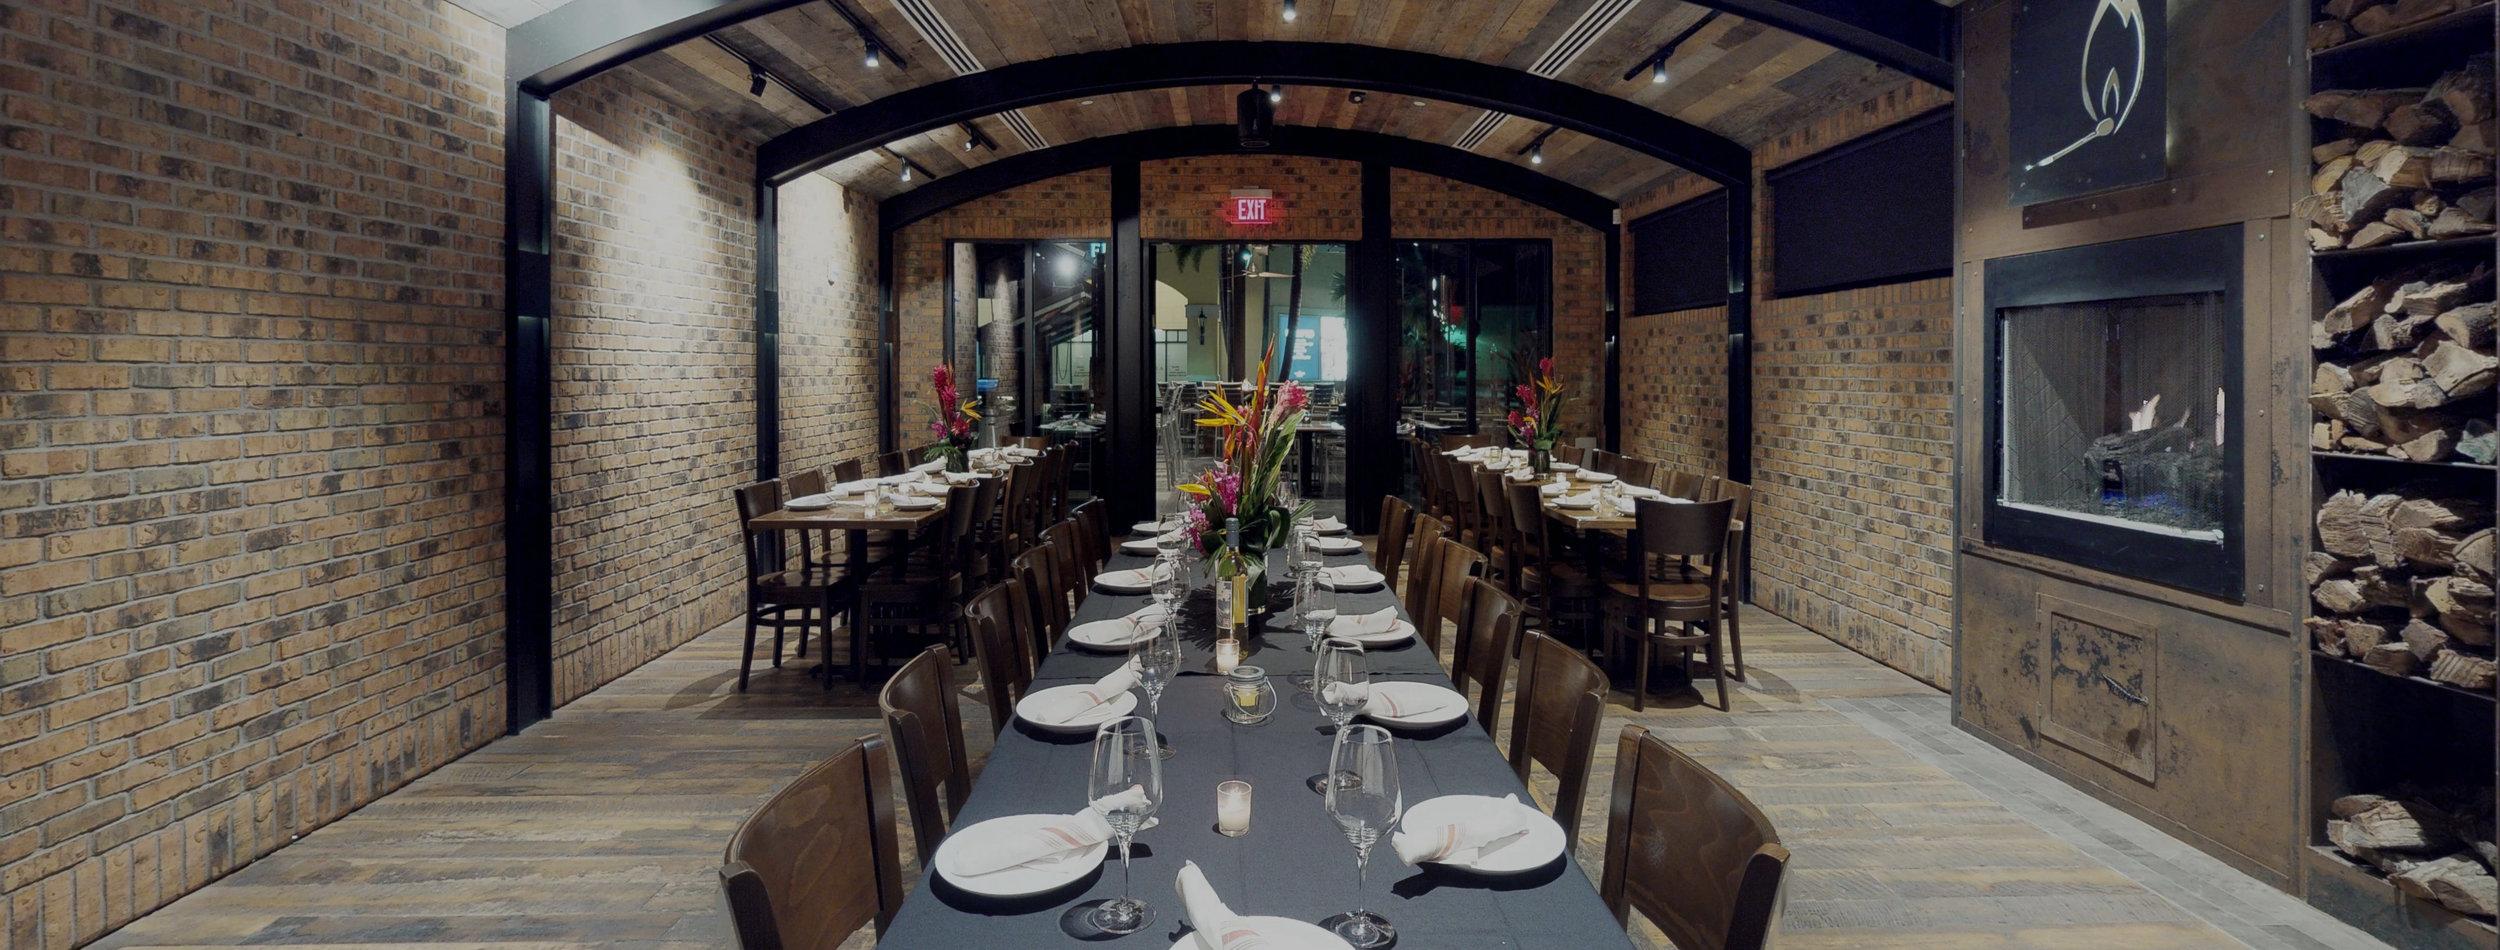 Events Matchbox Restaurants Eat Drink Share Gather